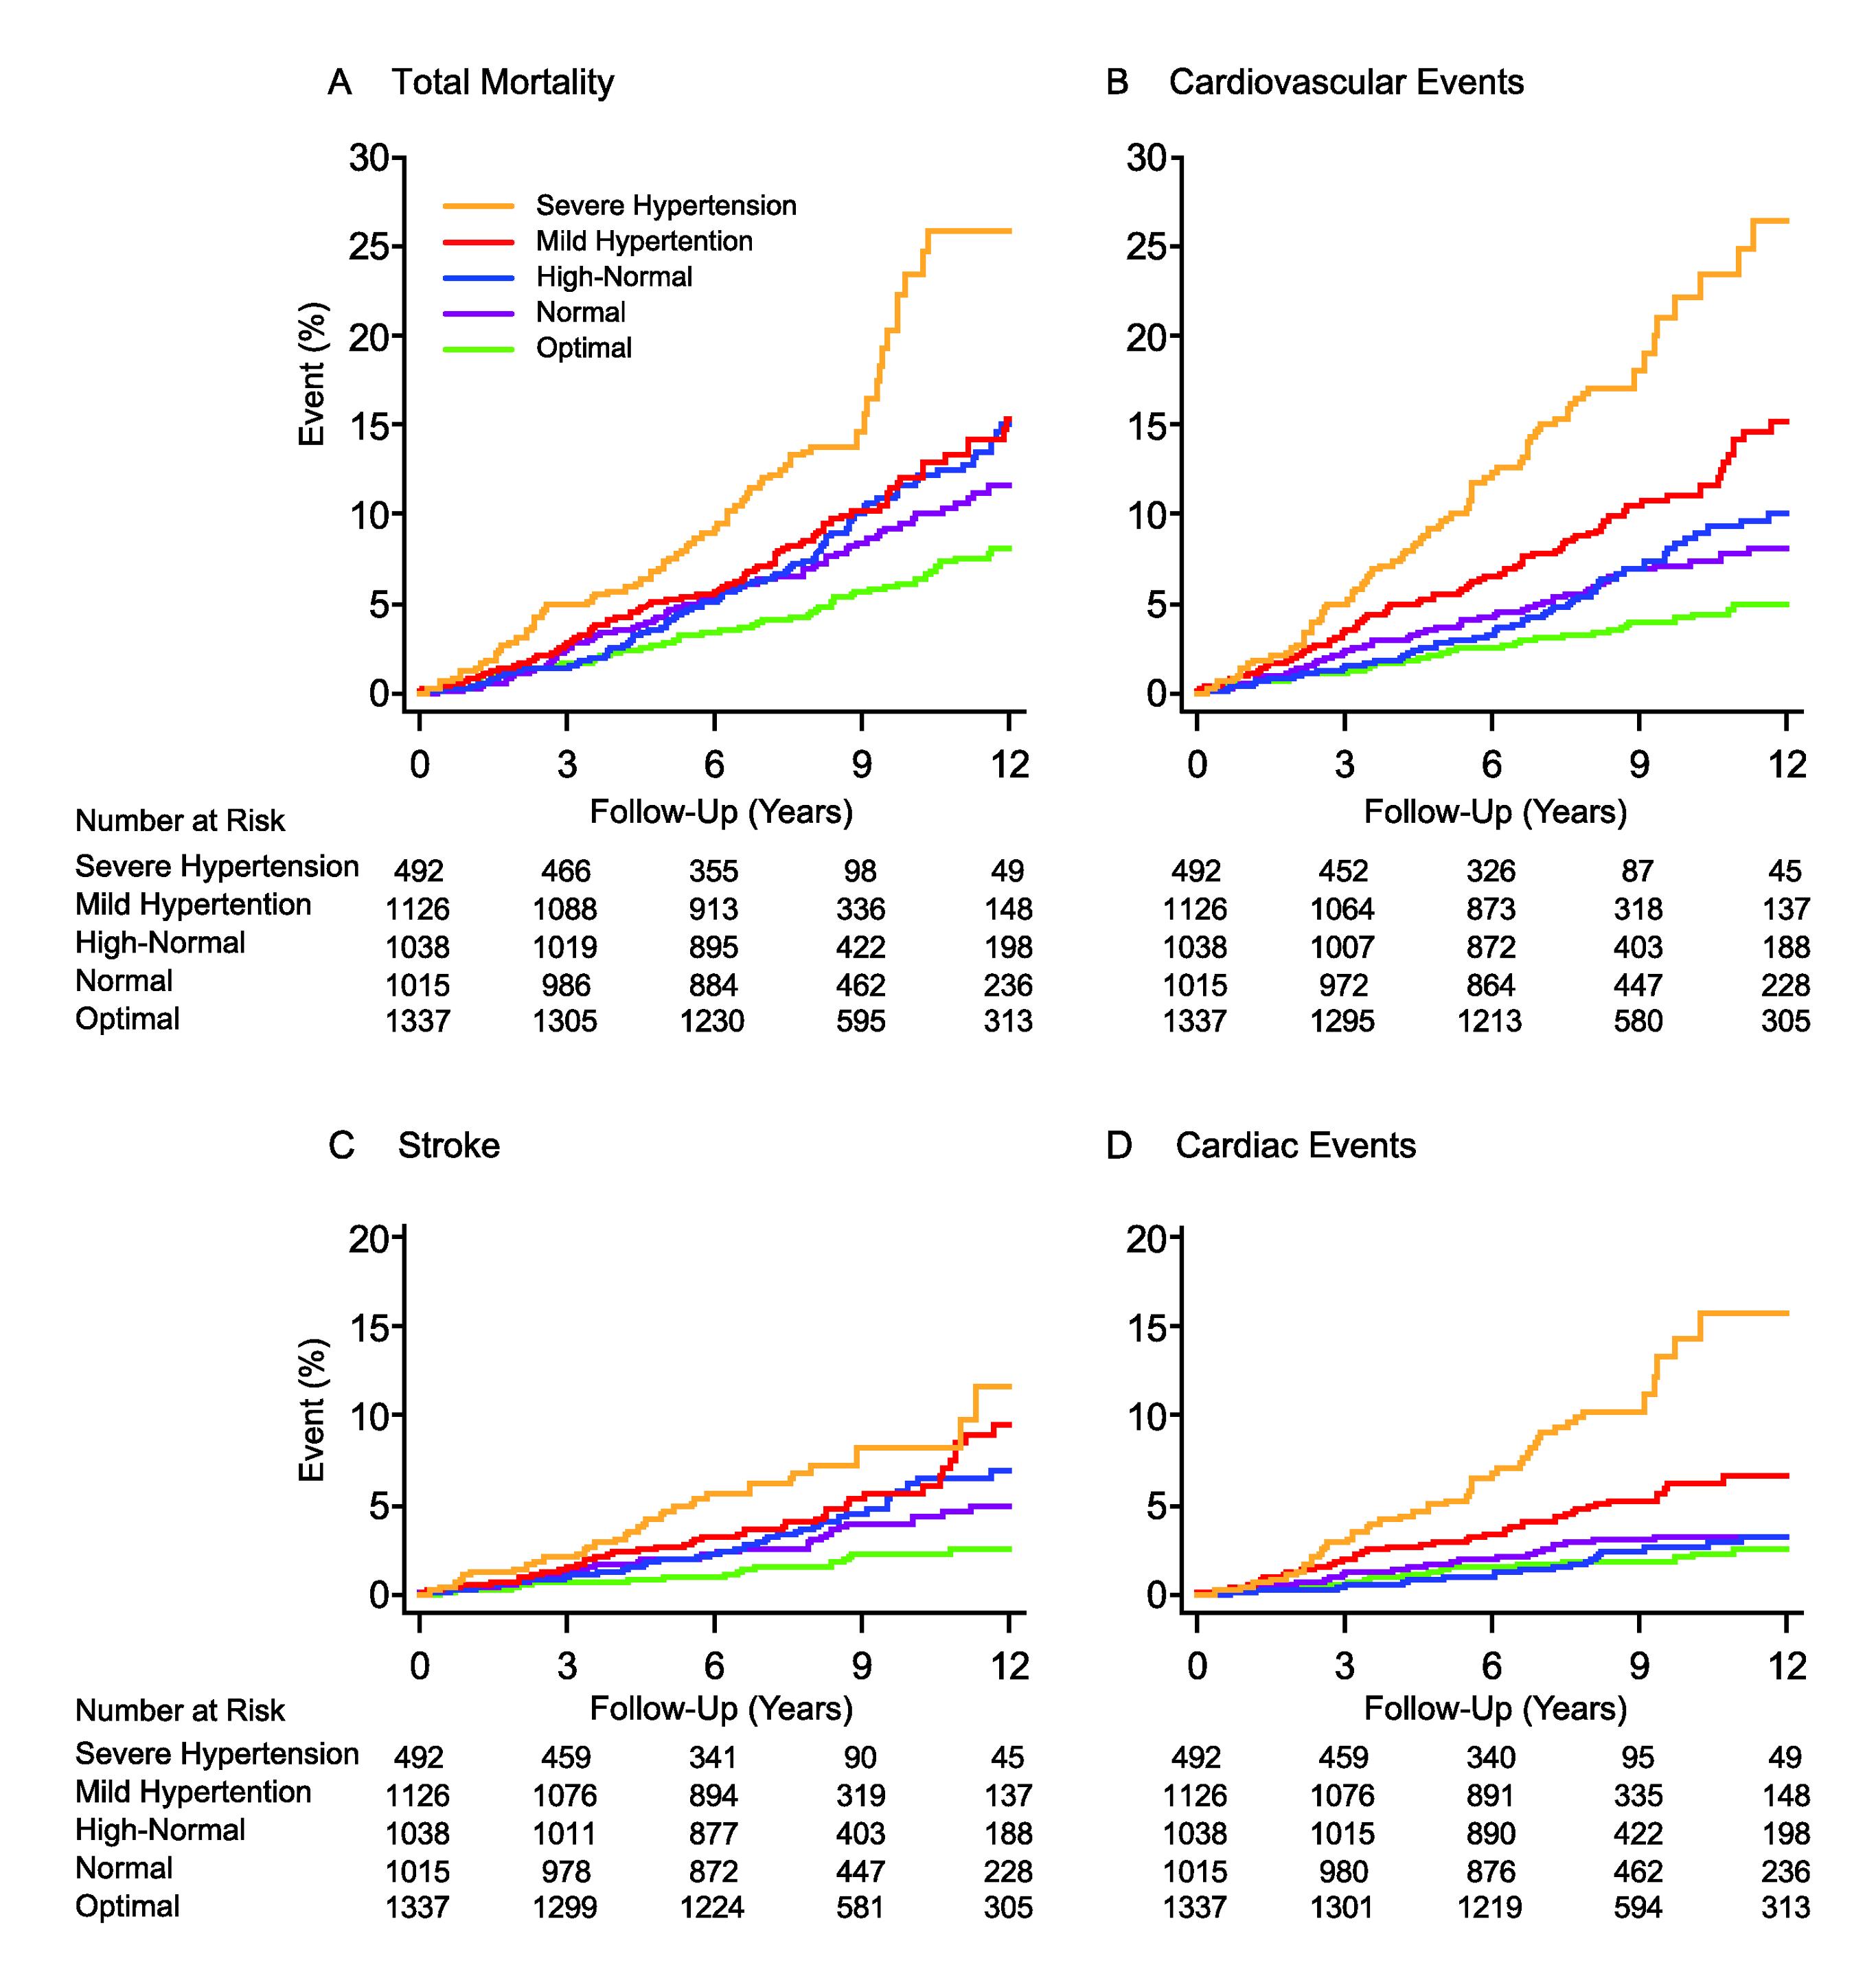 Kaplan-Meier survival function estimates by five categories of conventional blood pressure in 5,008 participants.